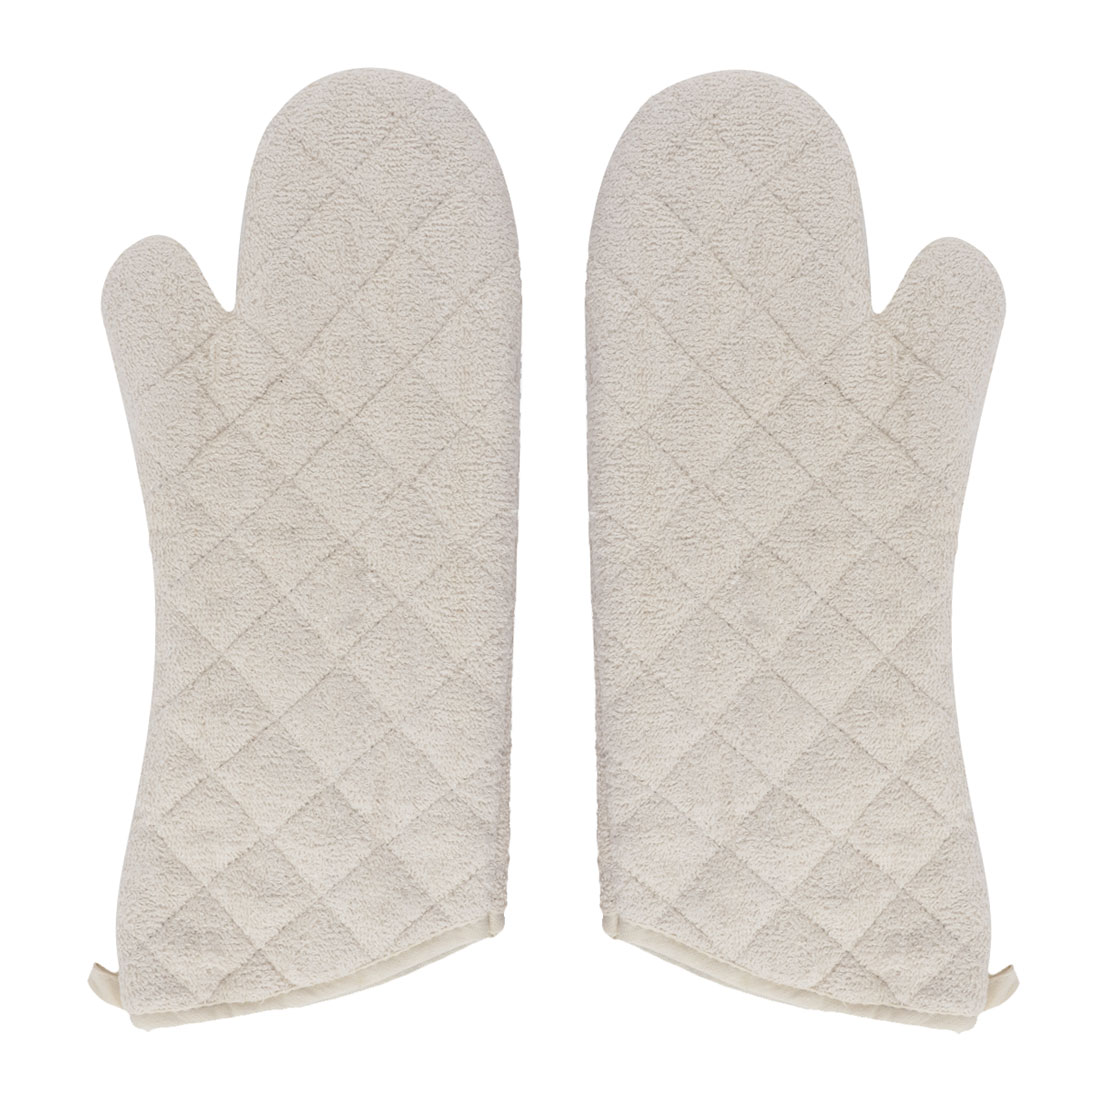 Kitchen Bakery Heat Hot Resistance Microwave Baking Oven Potholder Mitt Gloves Pair